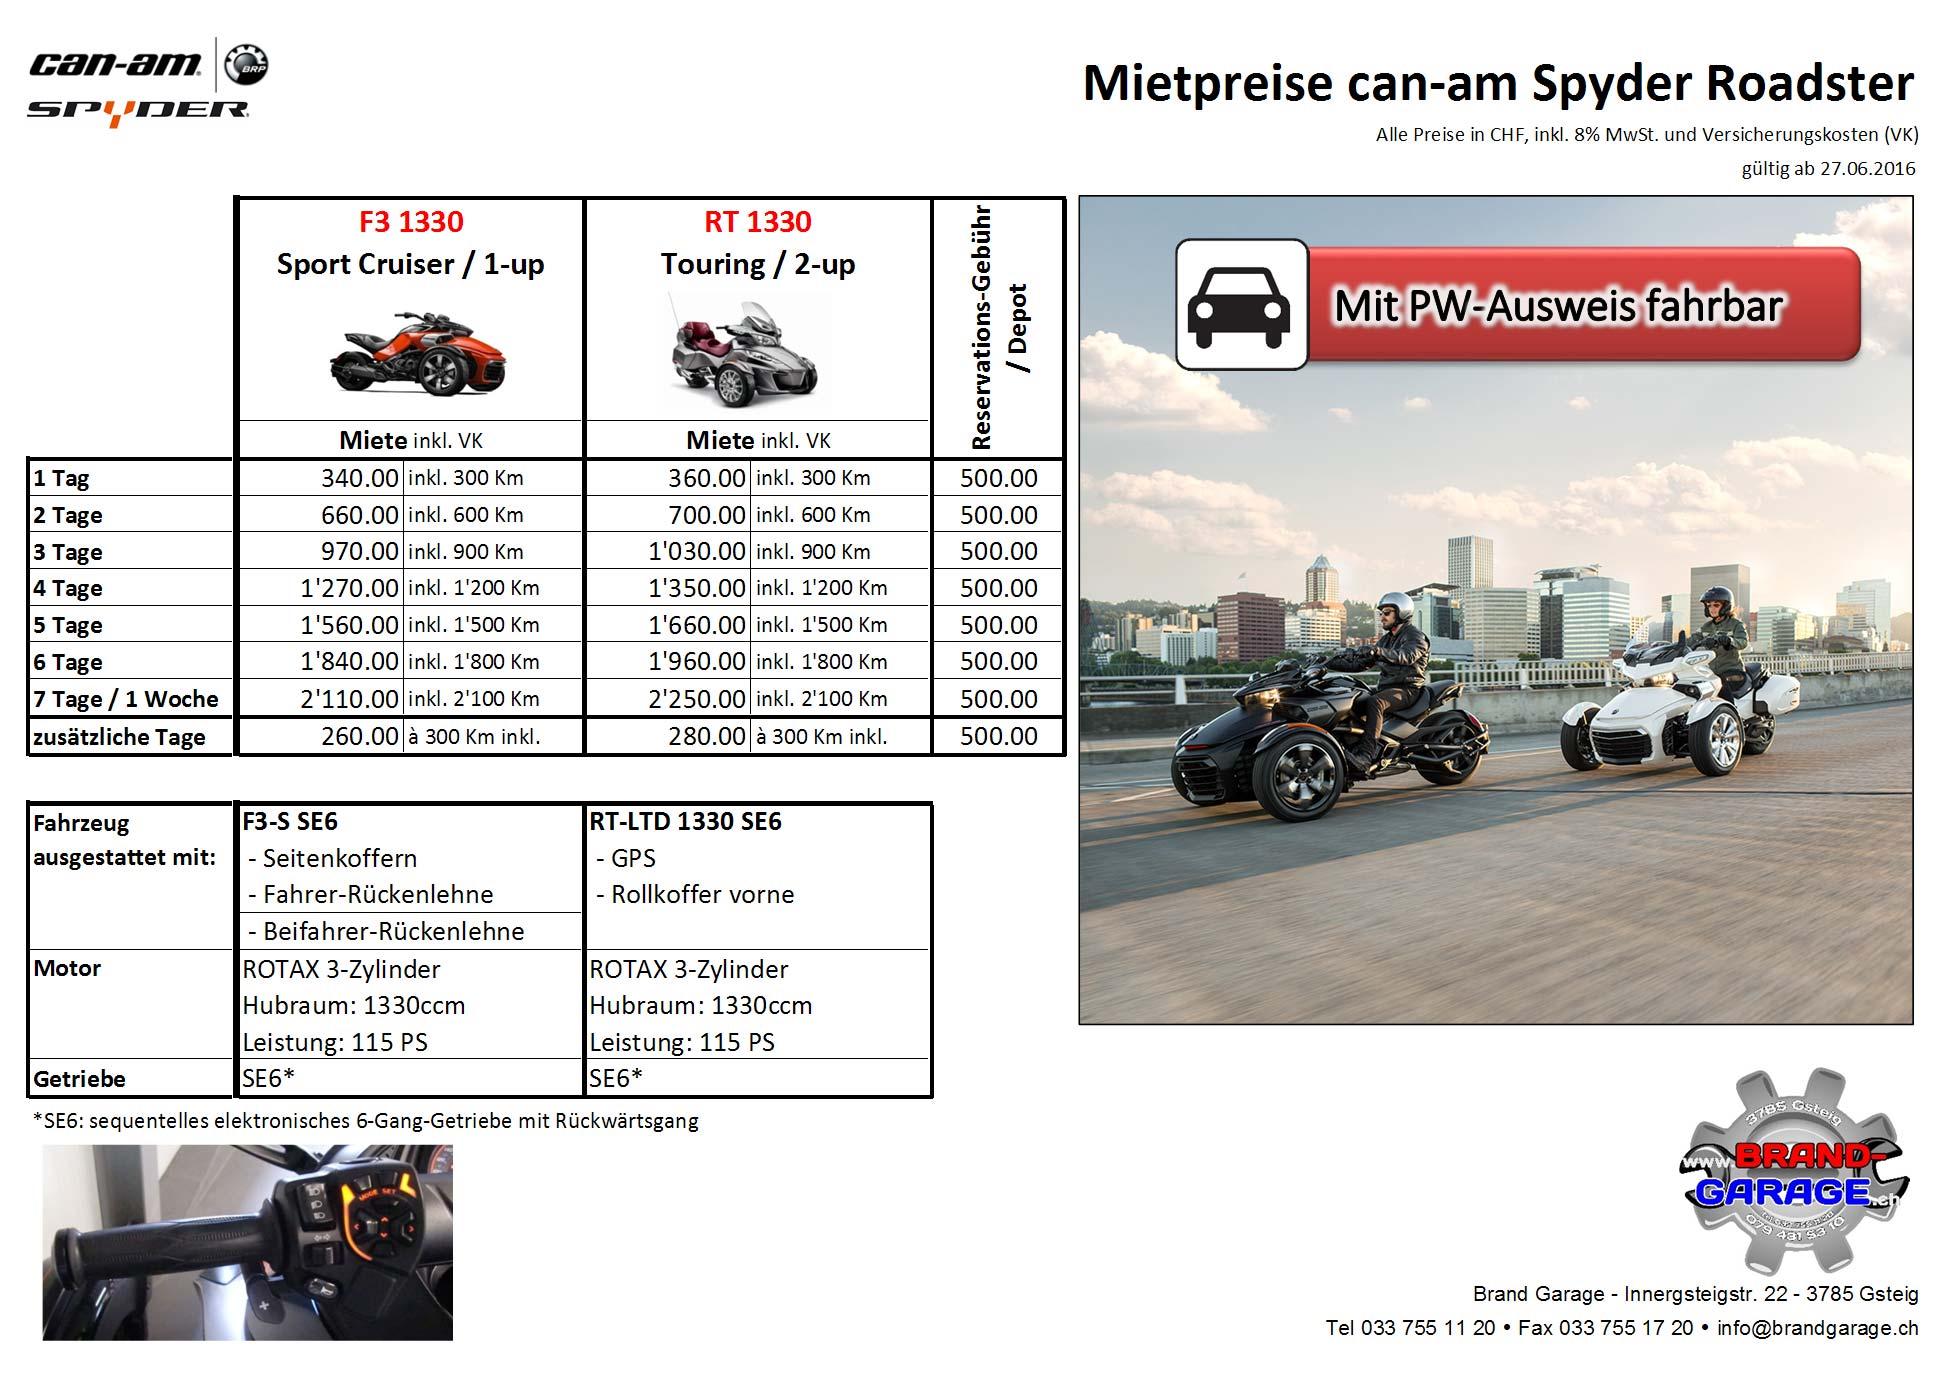 Mietpreisliste Spyder-Vermietung